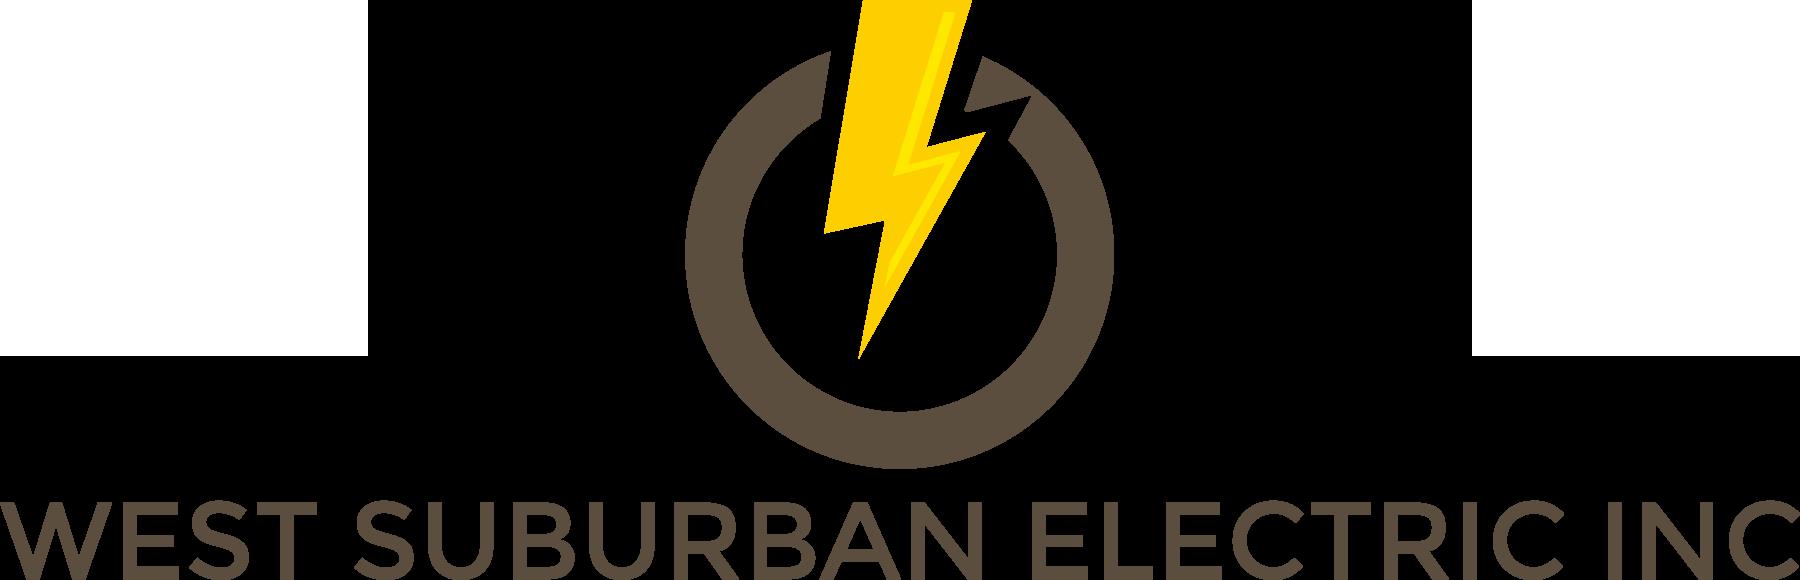 West Suburban Electric